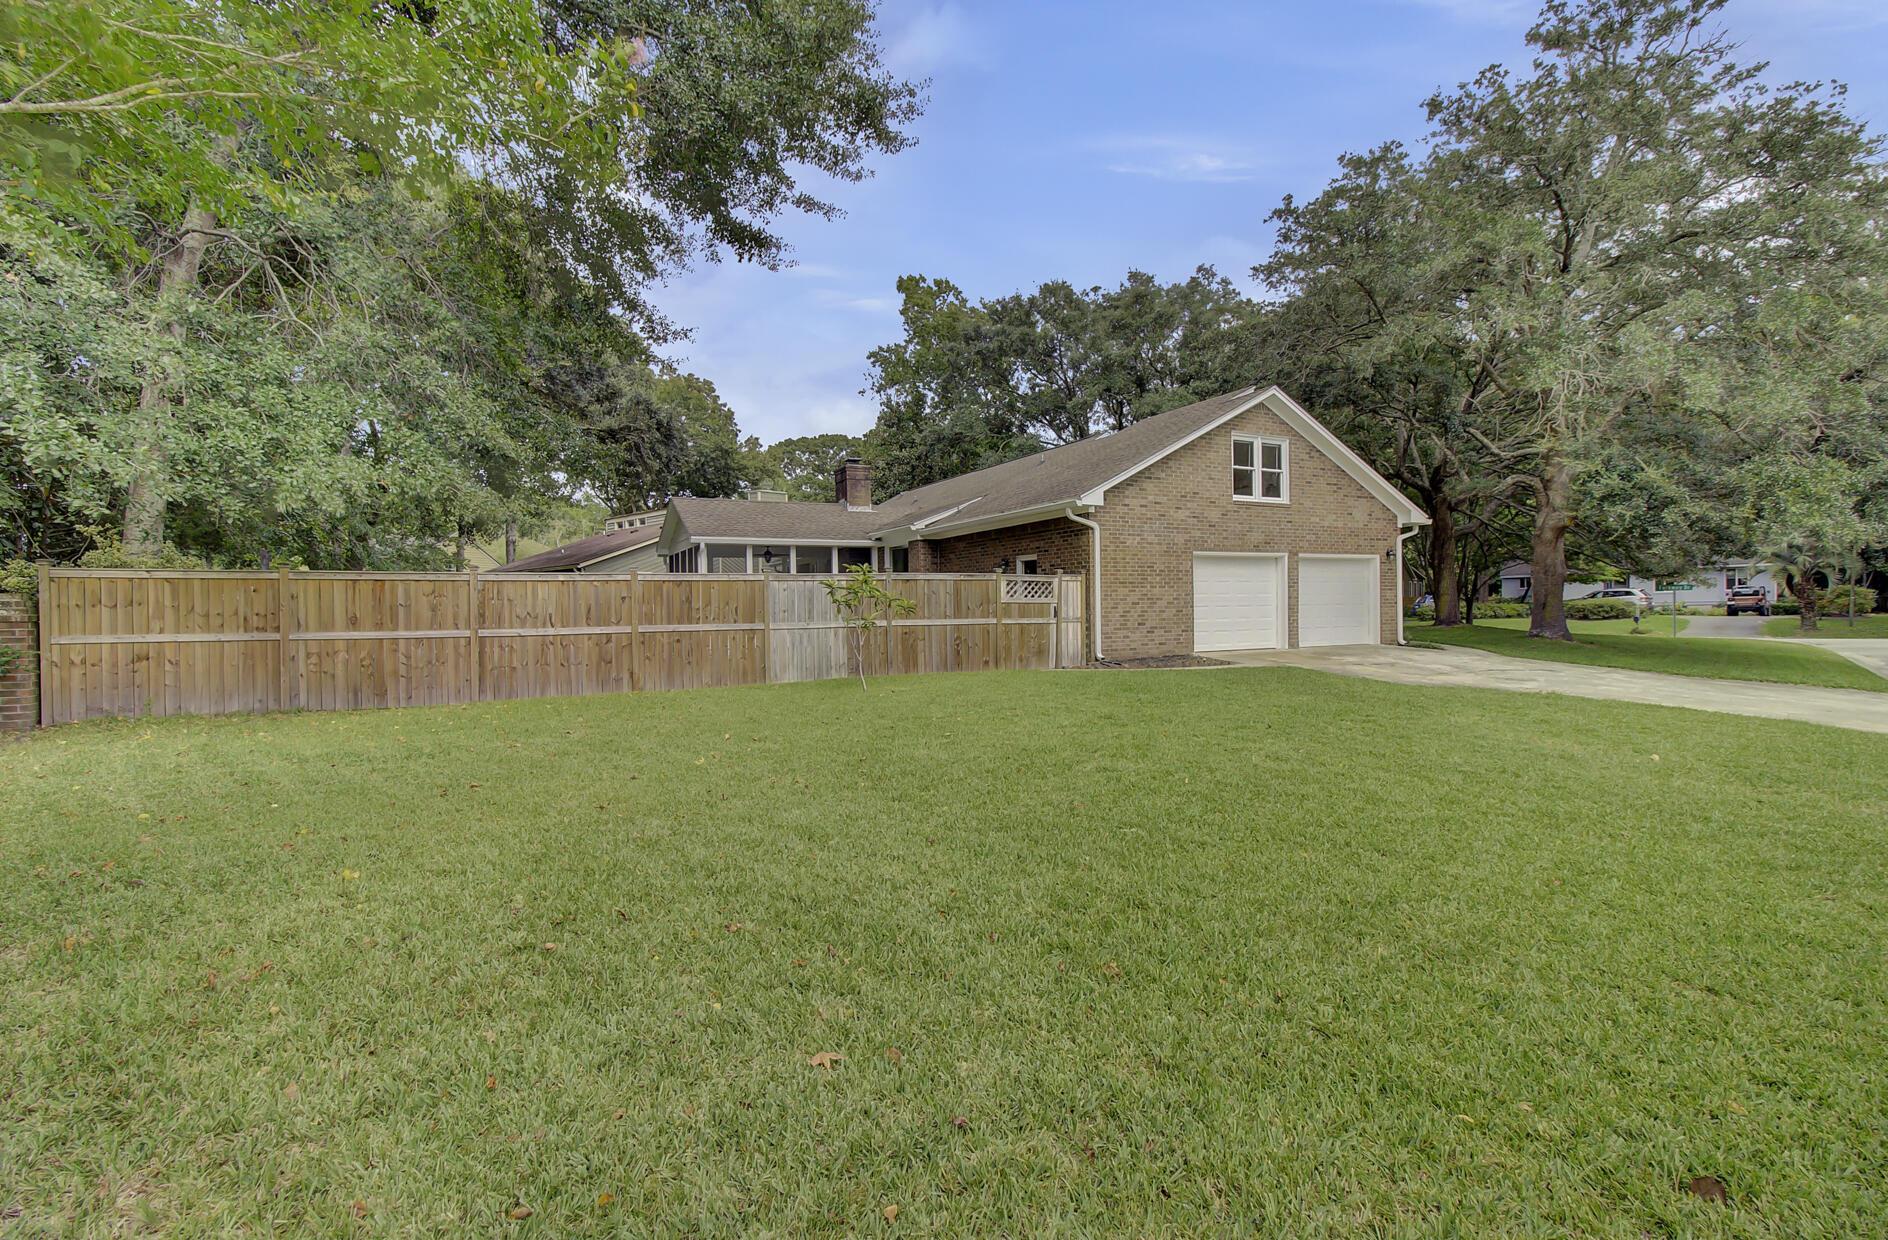 Snee Farm Homes For Sale - 1137 Parkway, Mount Pleasant, SC - 17